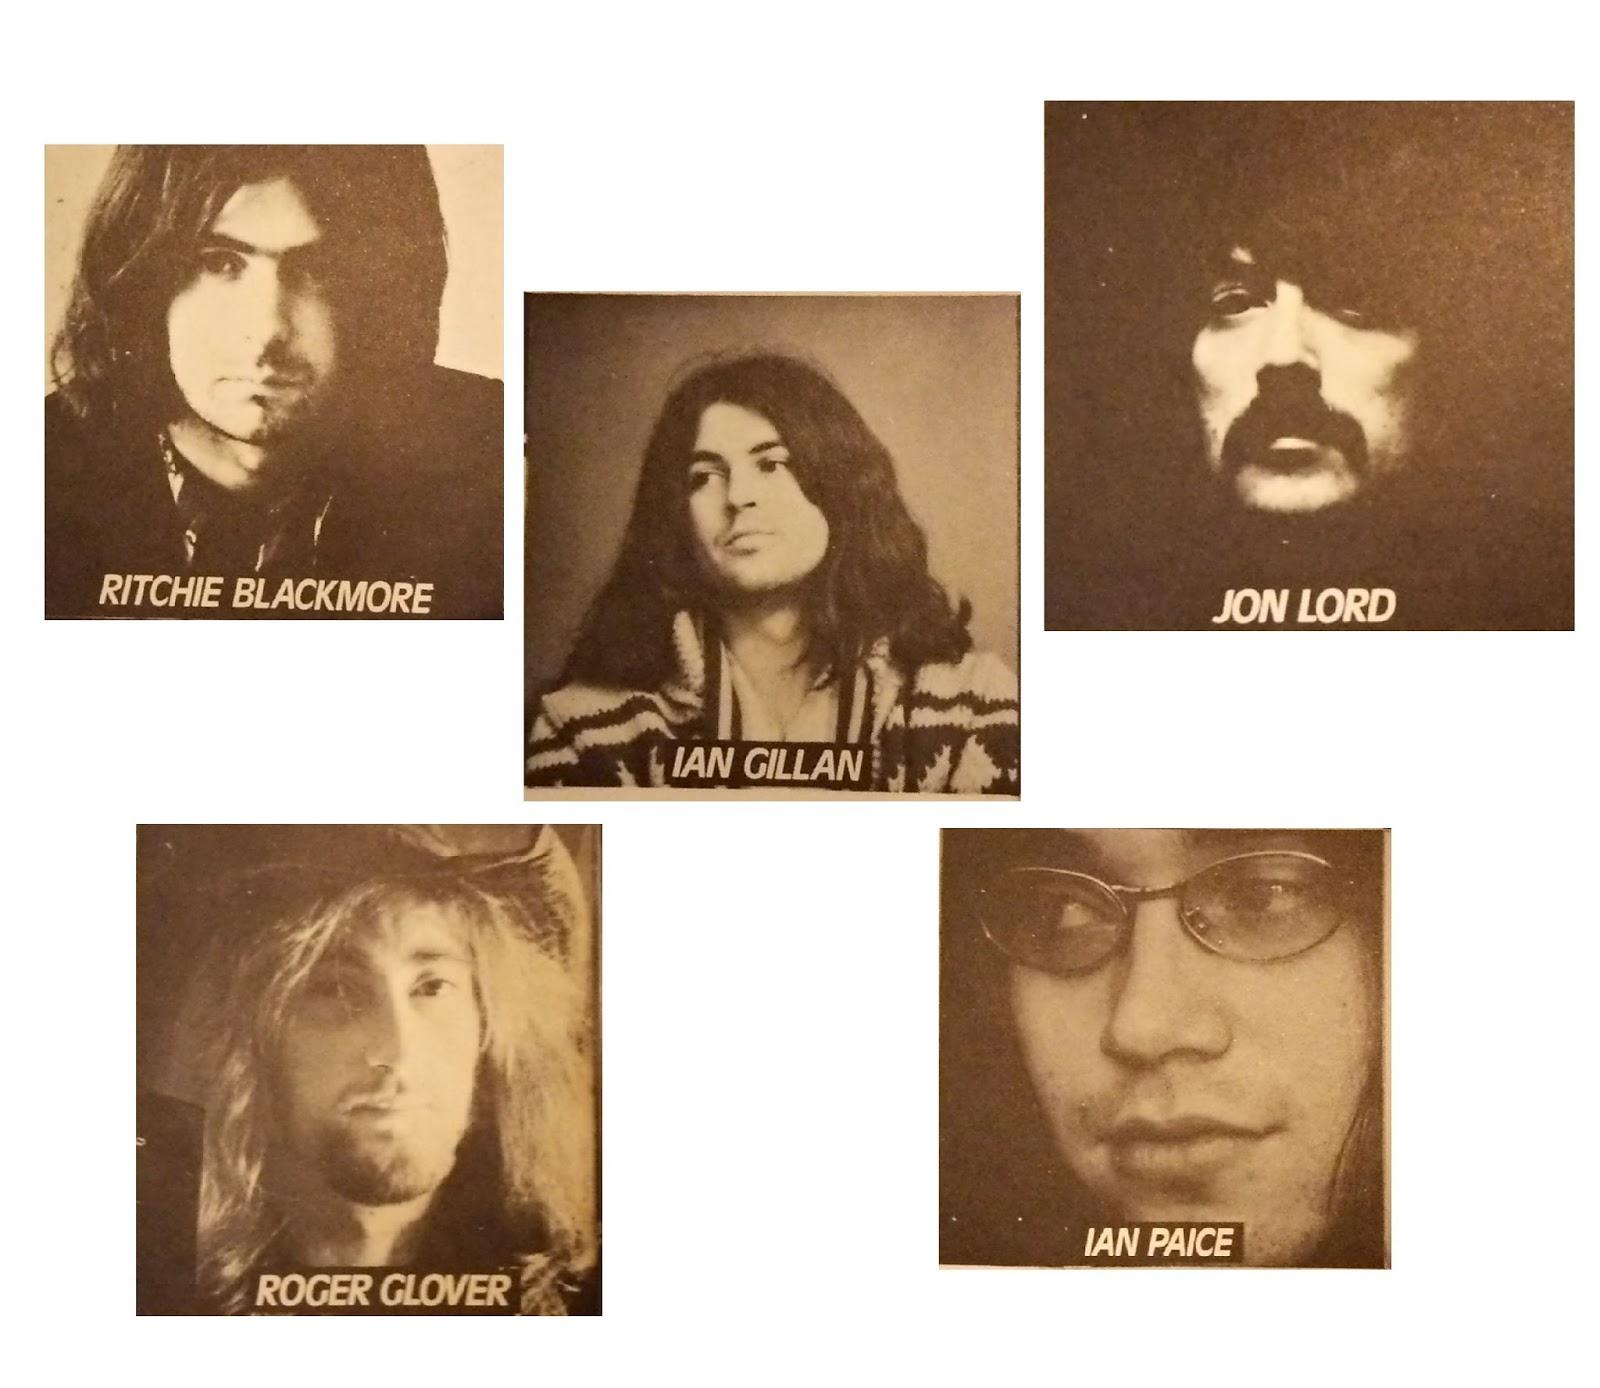 Deep Purple - Machine Head - members ディープ・パープル マシーン・ヘッド メンバー